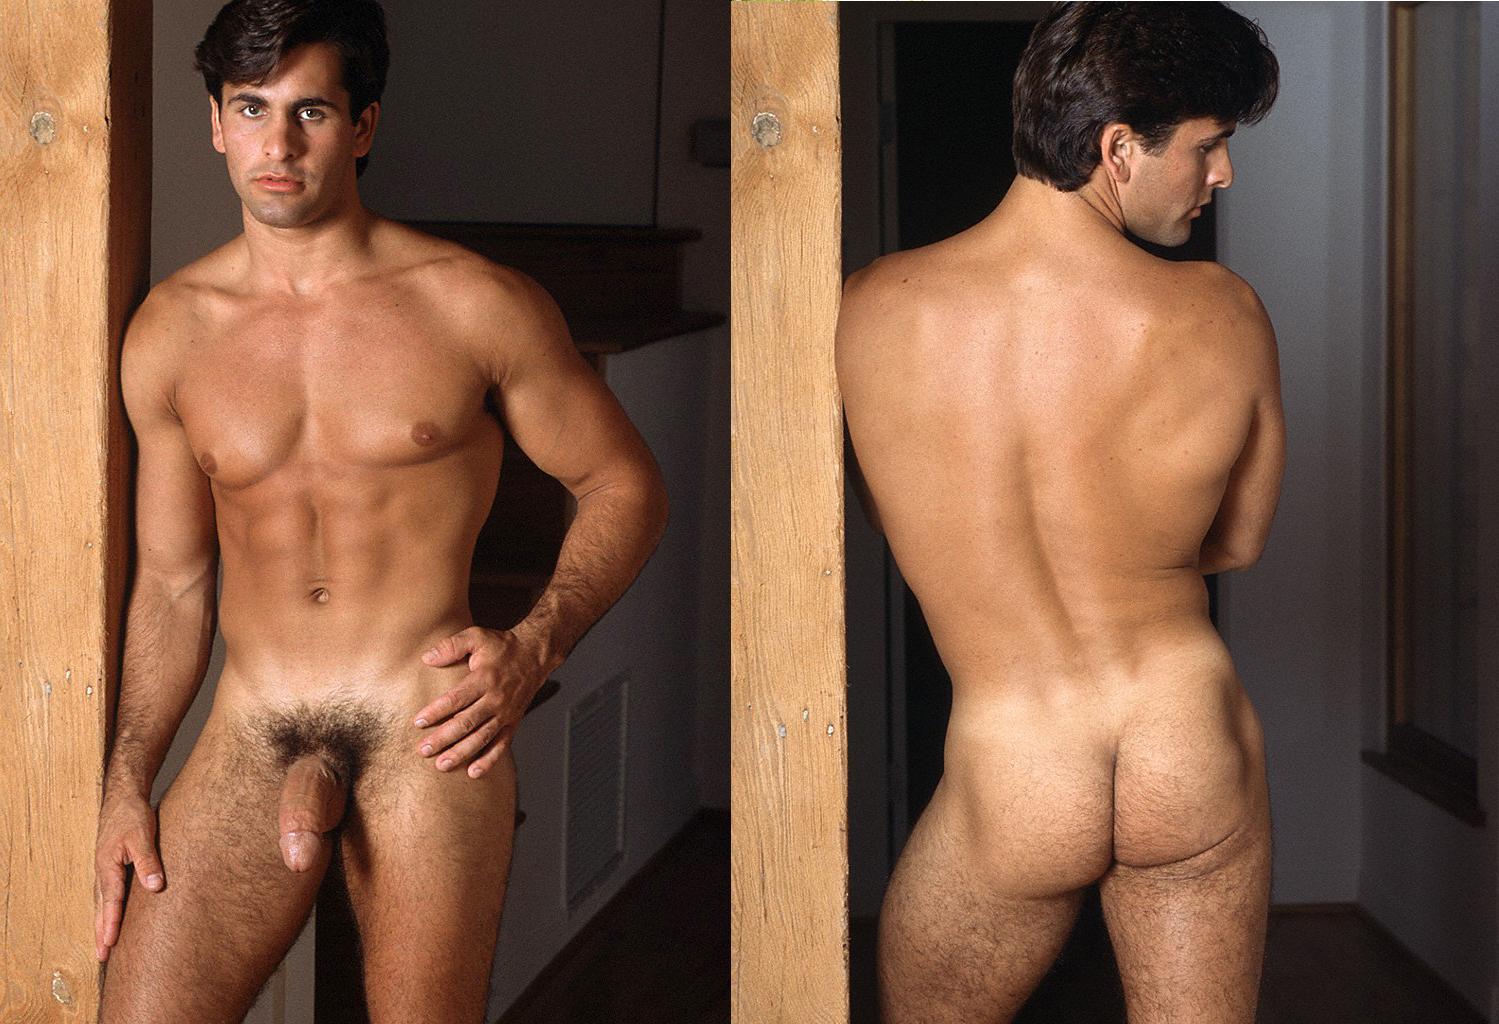 Lex baldwin nude pic — img 1